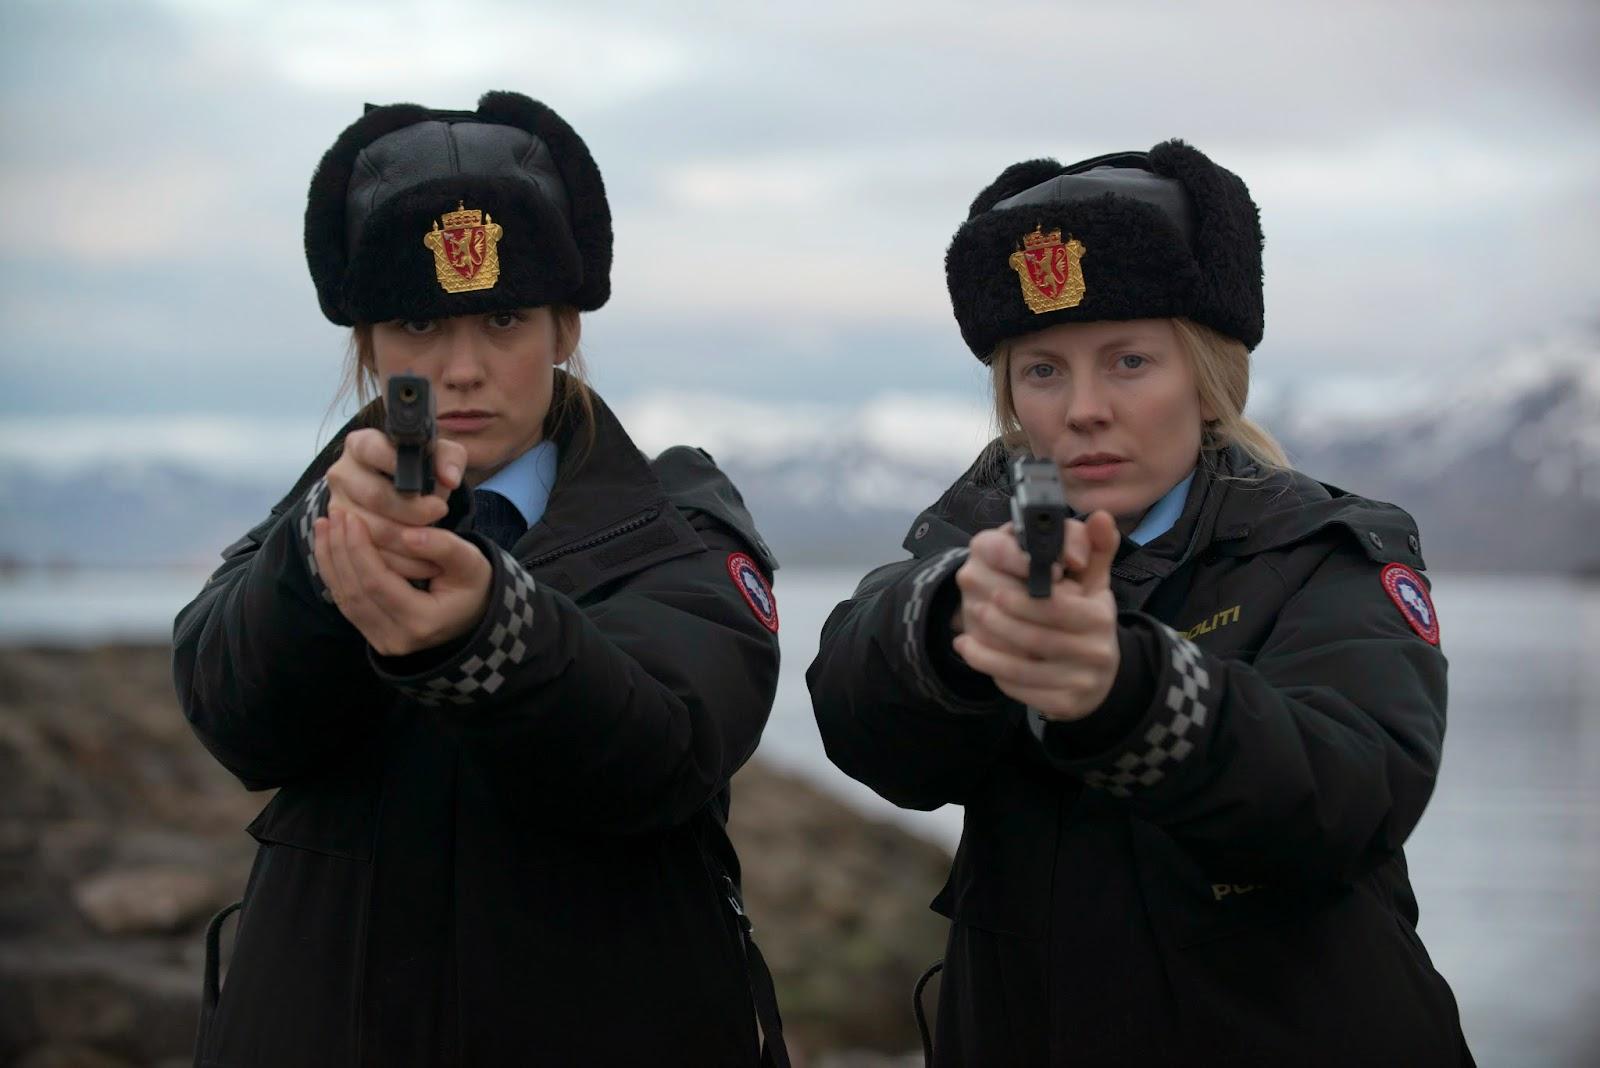 Mia Jexen as PC Ingrid; Alexandra Moen as PC Petra in Fortitude